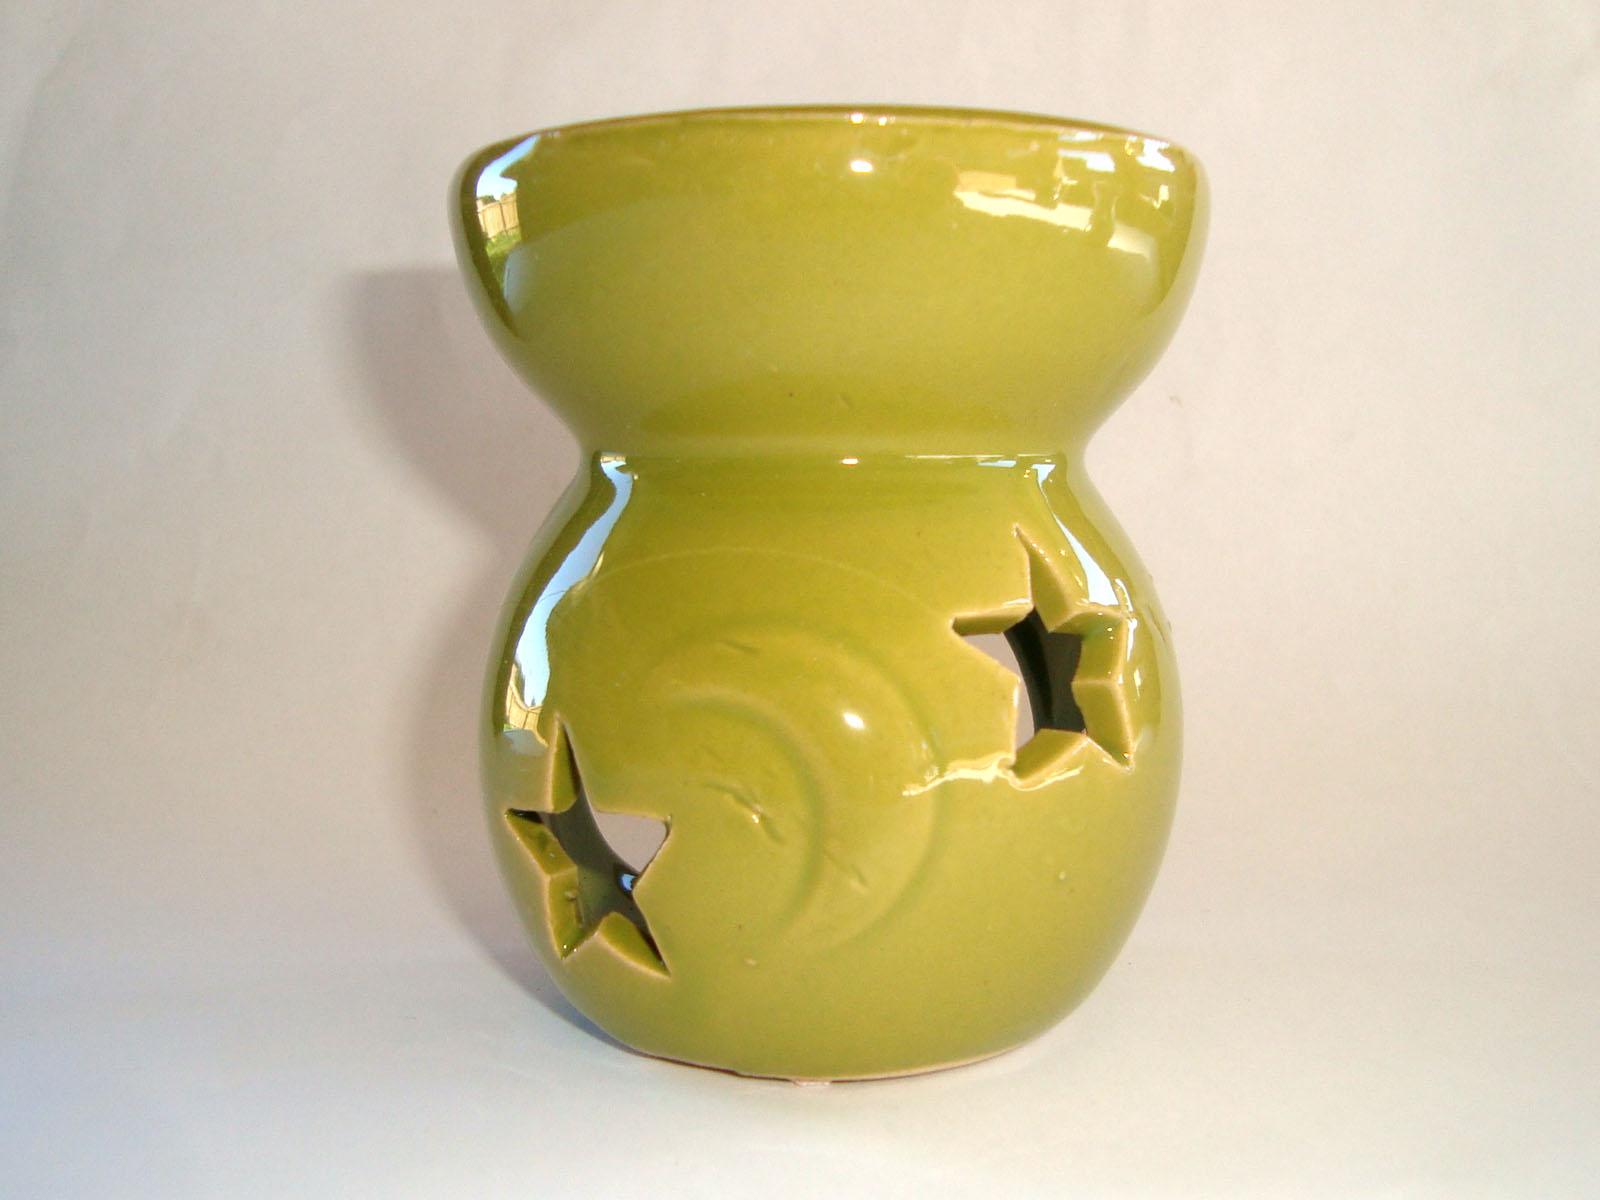 Small Oil Burner - Star Moon - Lime